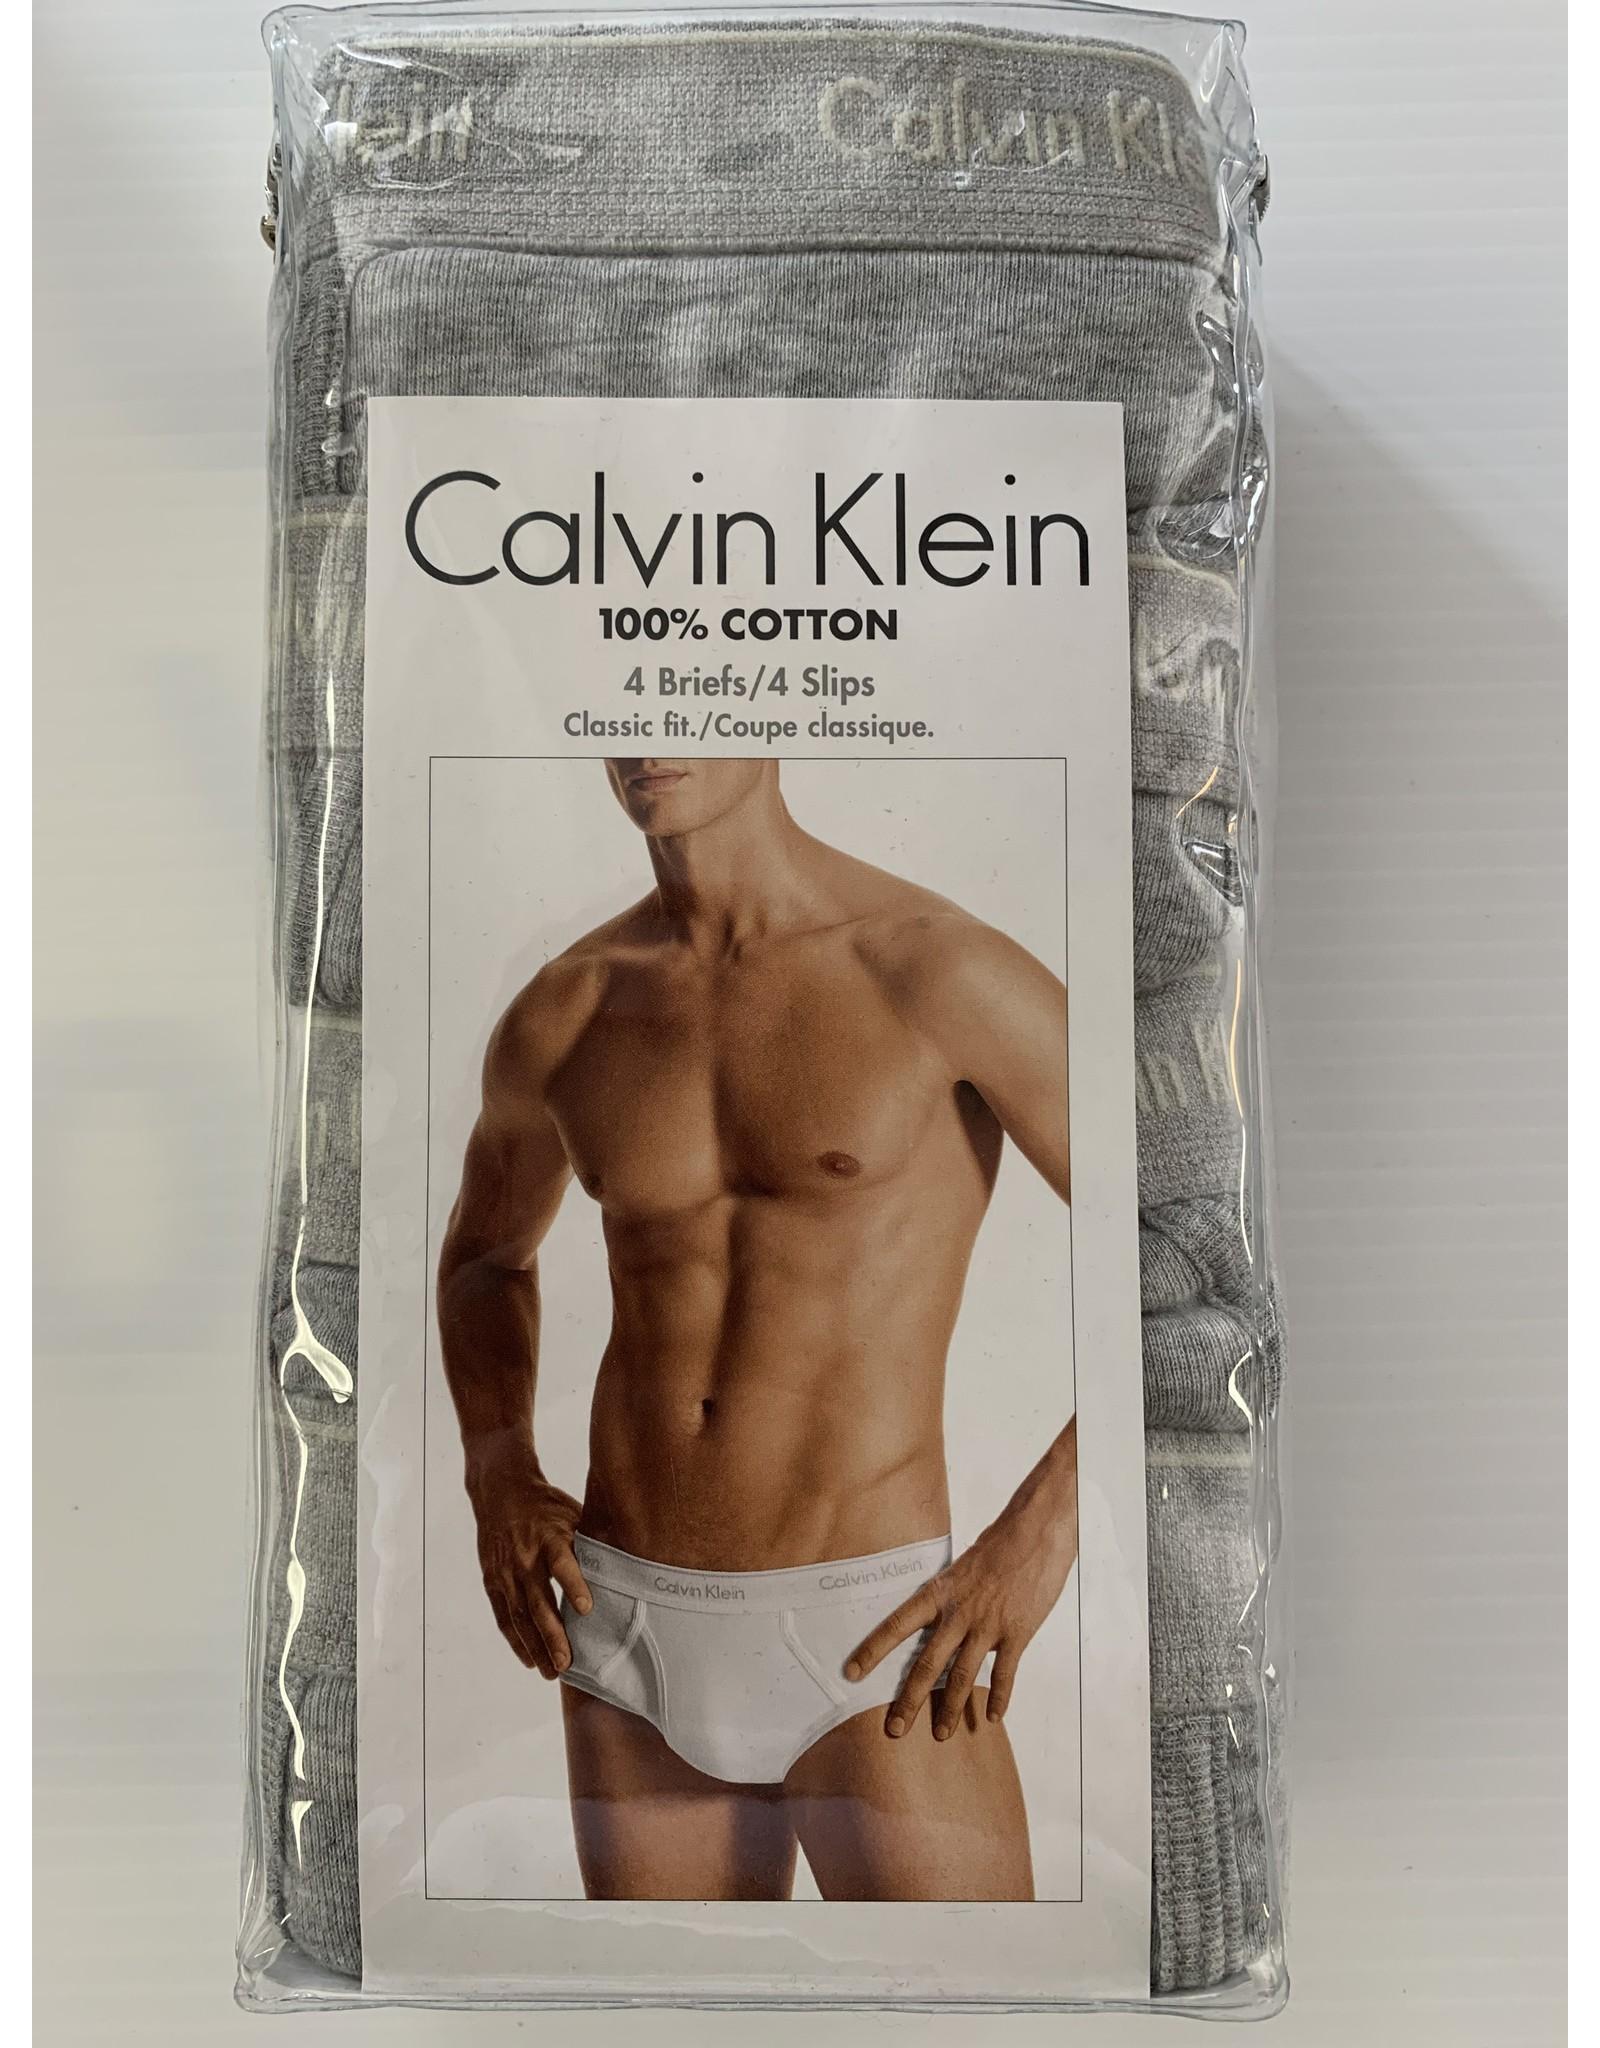 Calvin Klein Calvin Klein Men's Classic Cotton Briefs 4-Pack